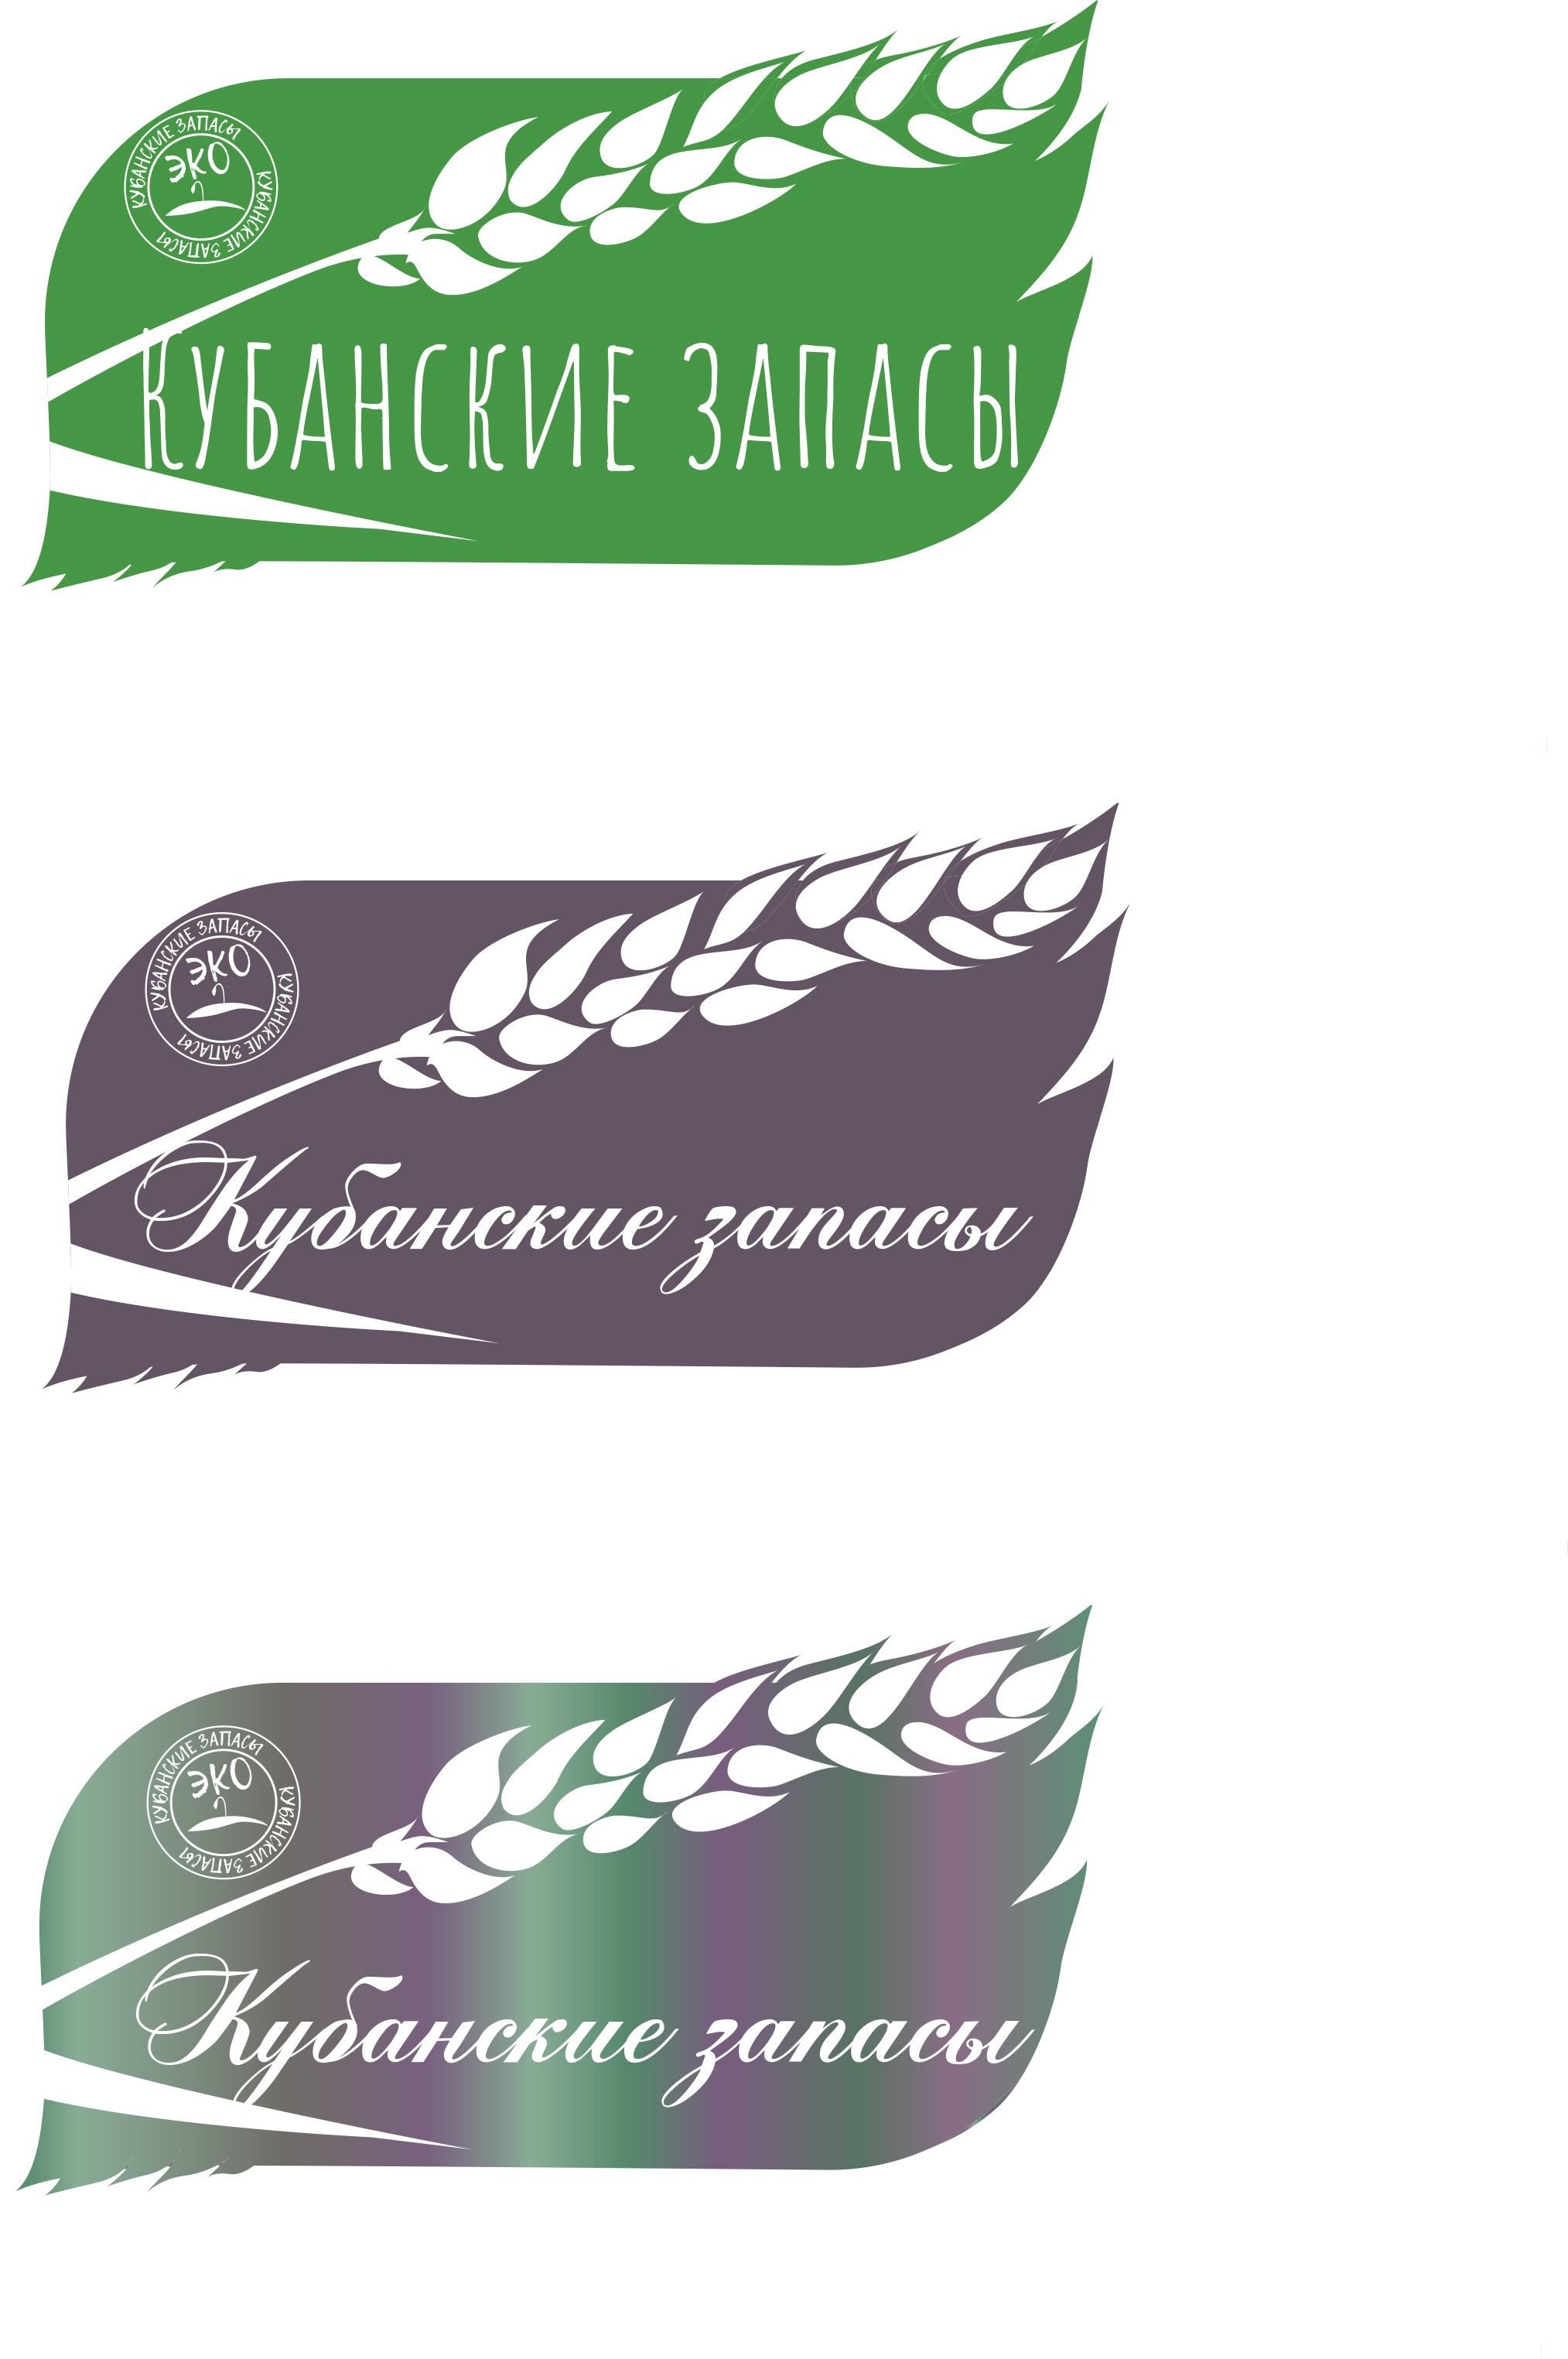 Логотип, фирменный стиль фото f_3375de26bc55fd43.jpg